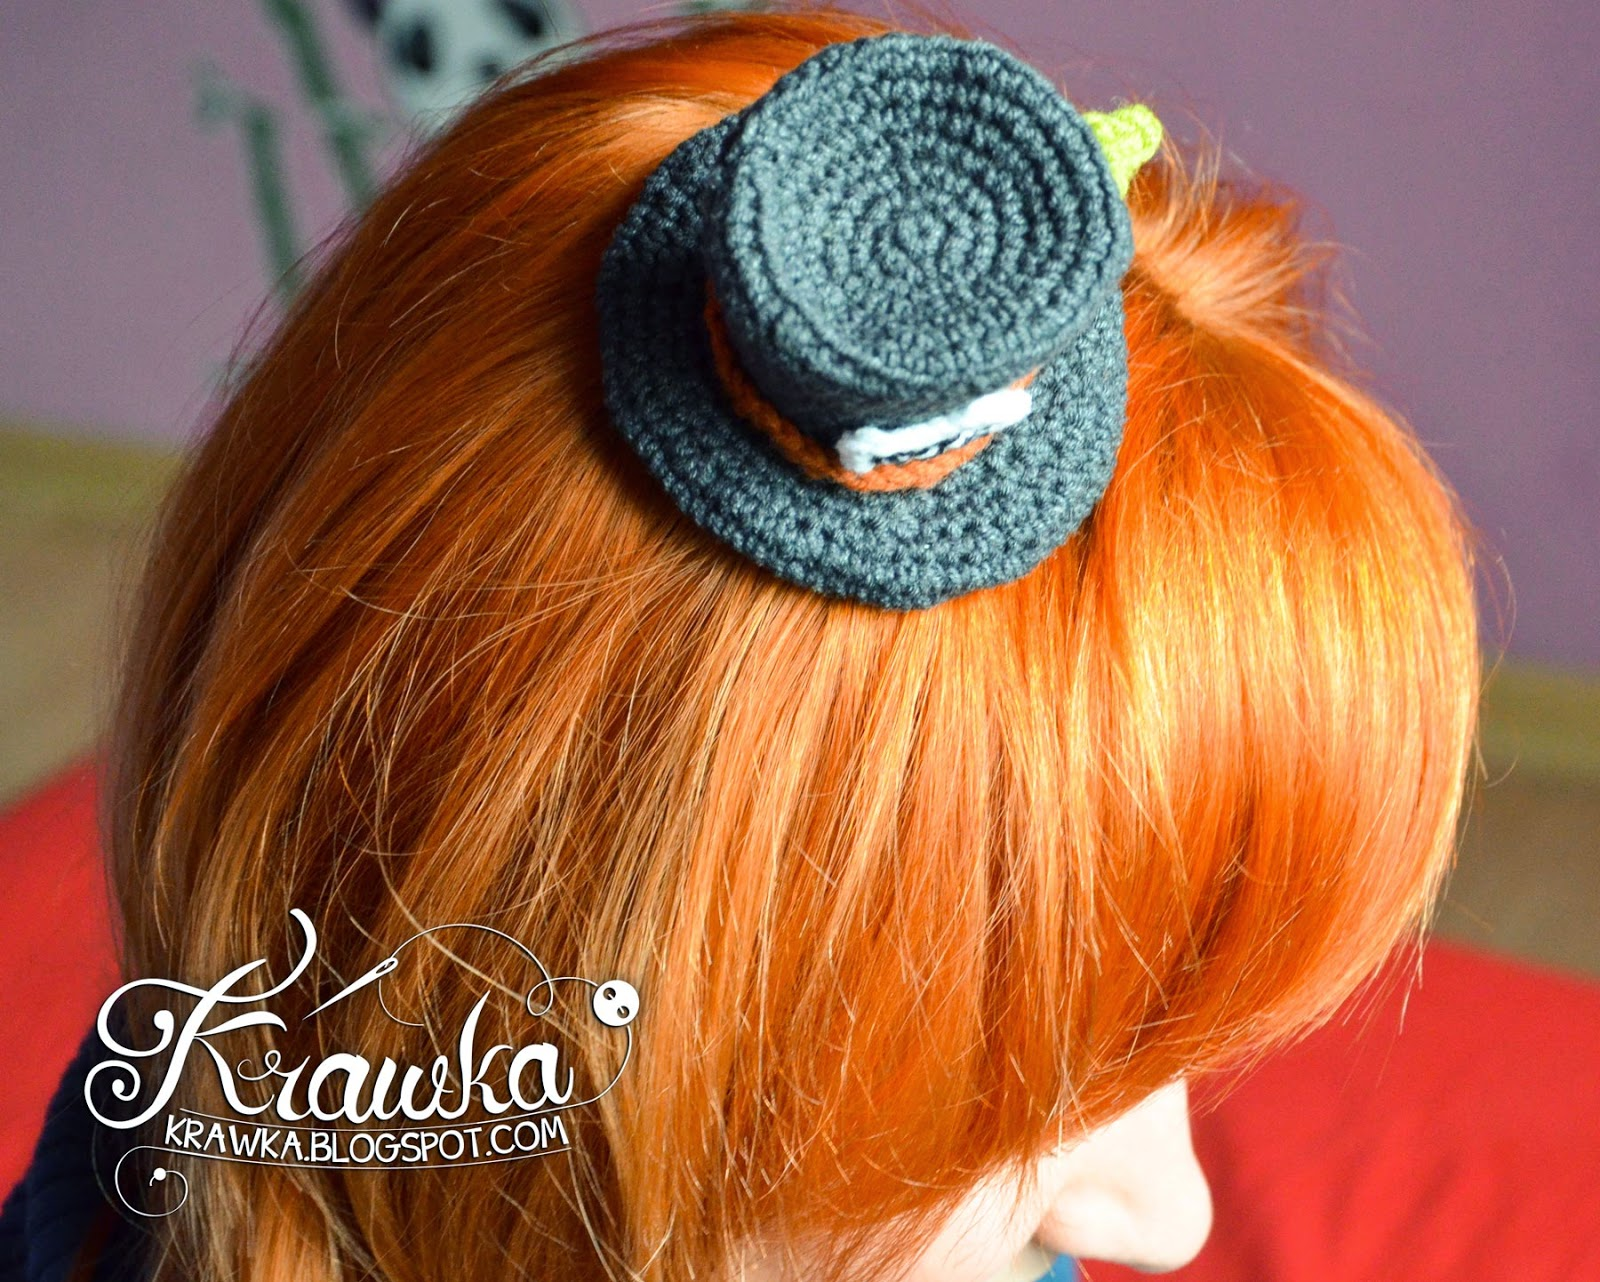 Krawka: Crazy cute crochet pattern for little Mad Hatter's hat - hair accesory